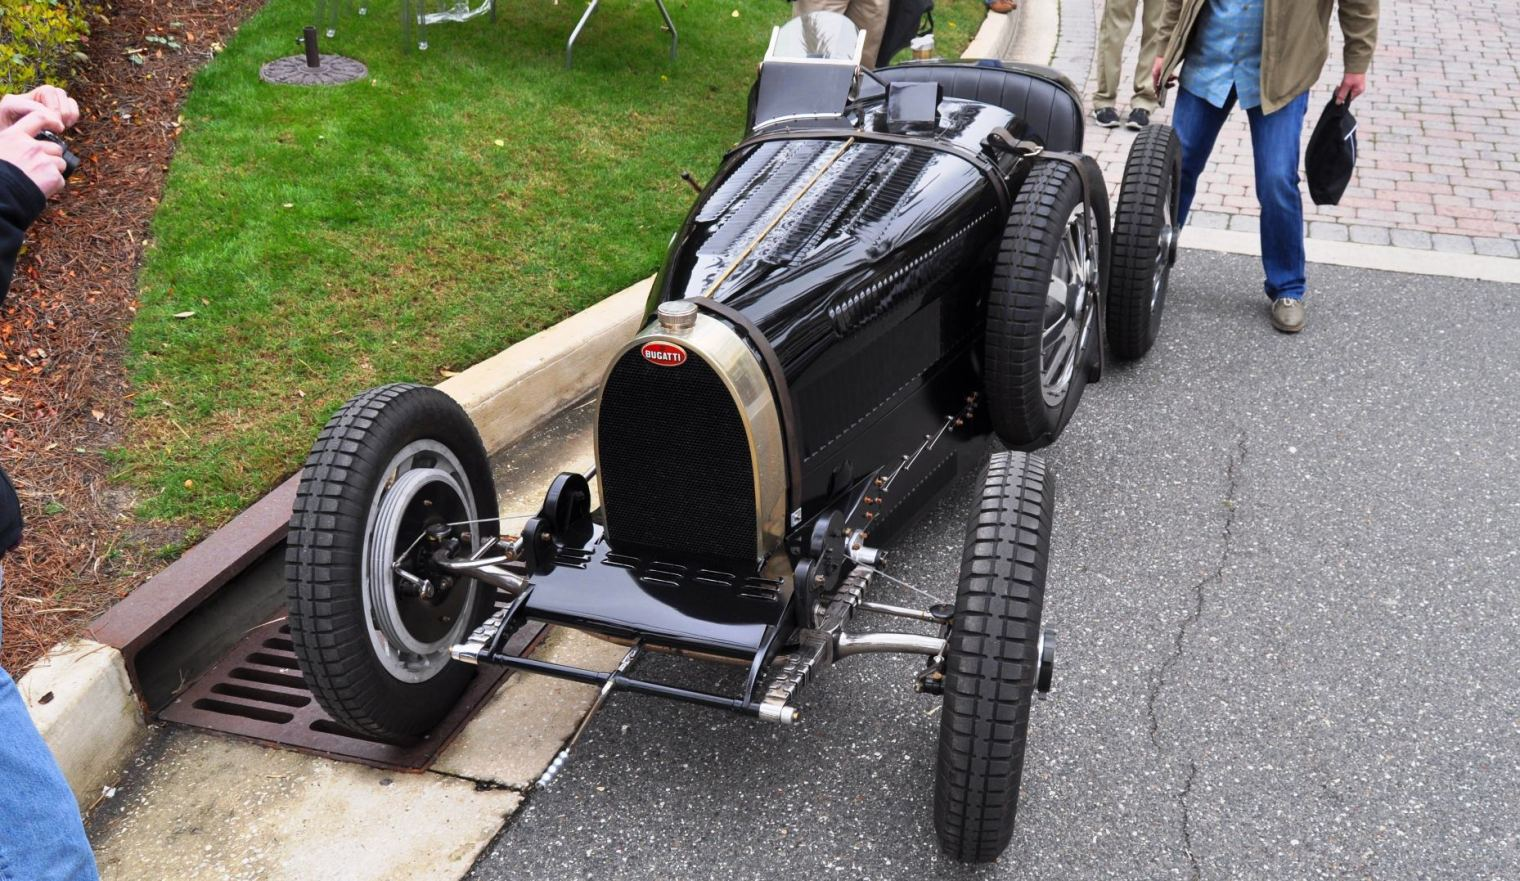 PurSang Argentina Shows Innovative Marketing with Street-Parked 1920s Bugatti GP Car26